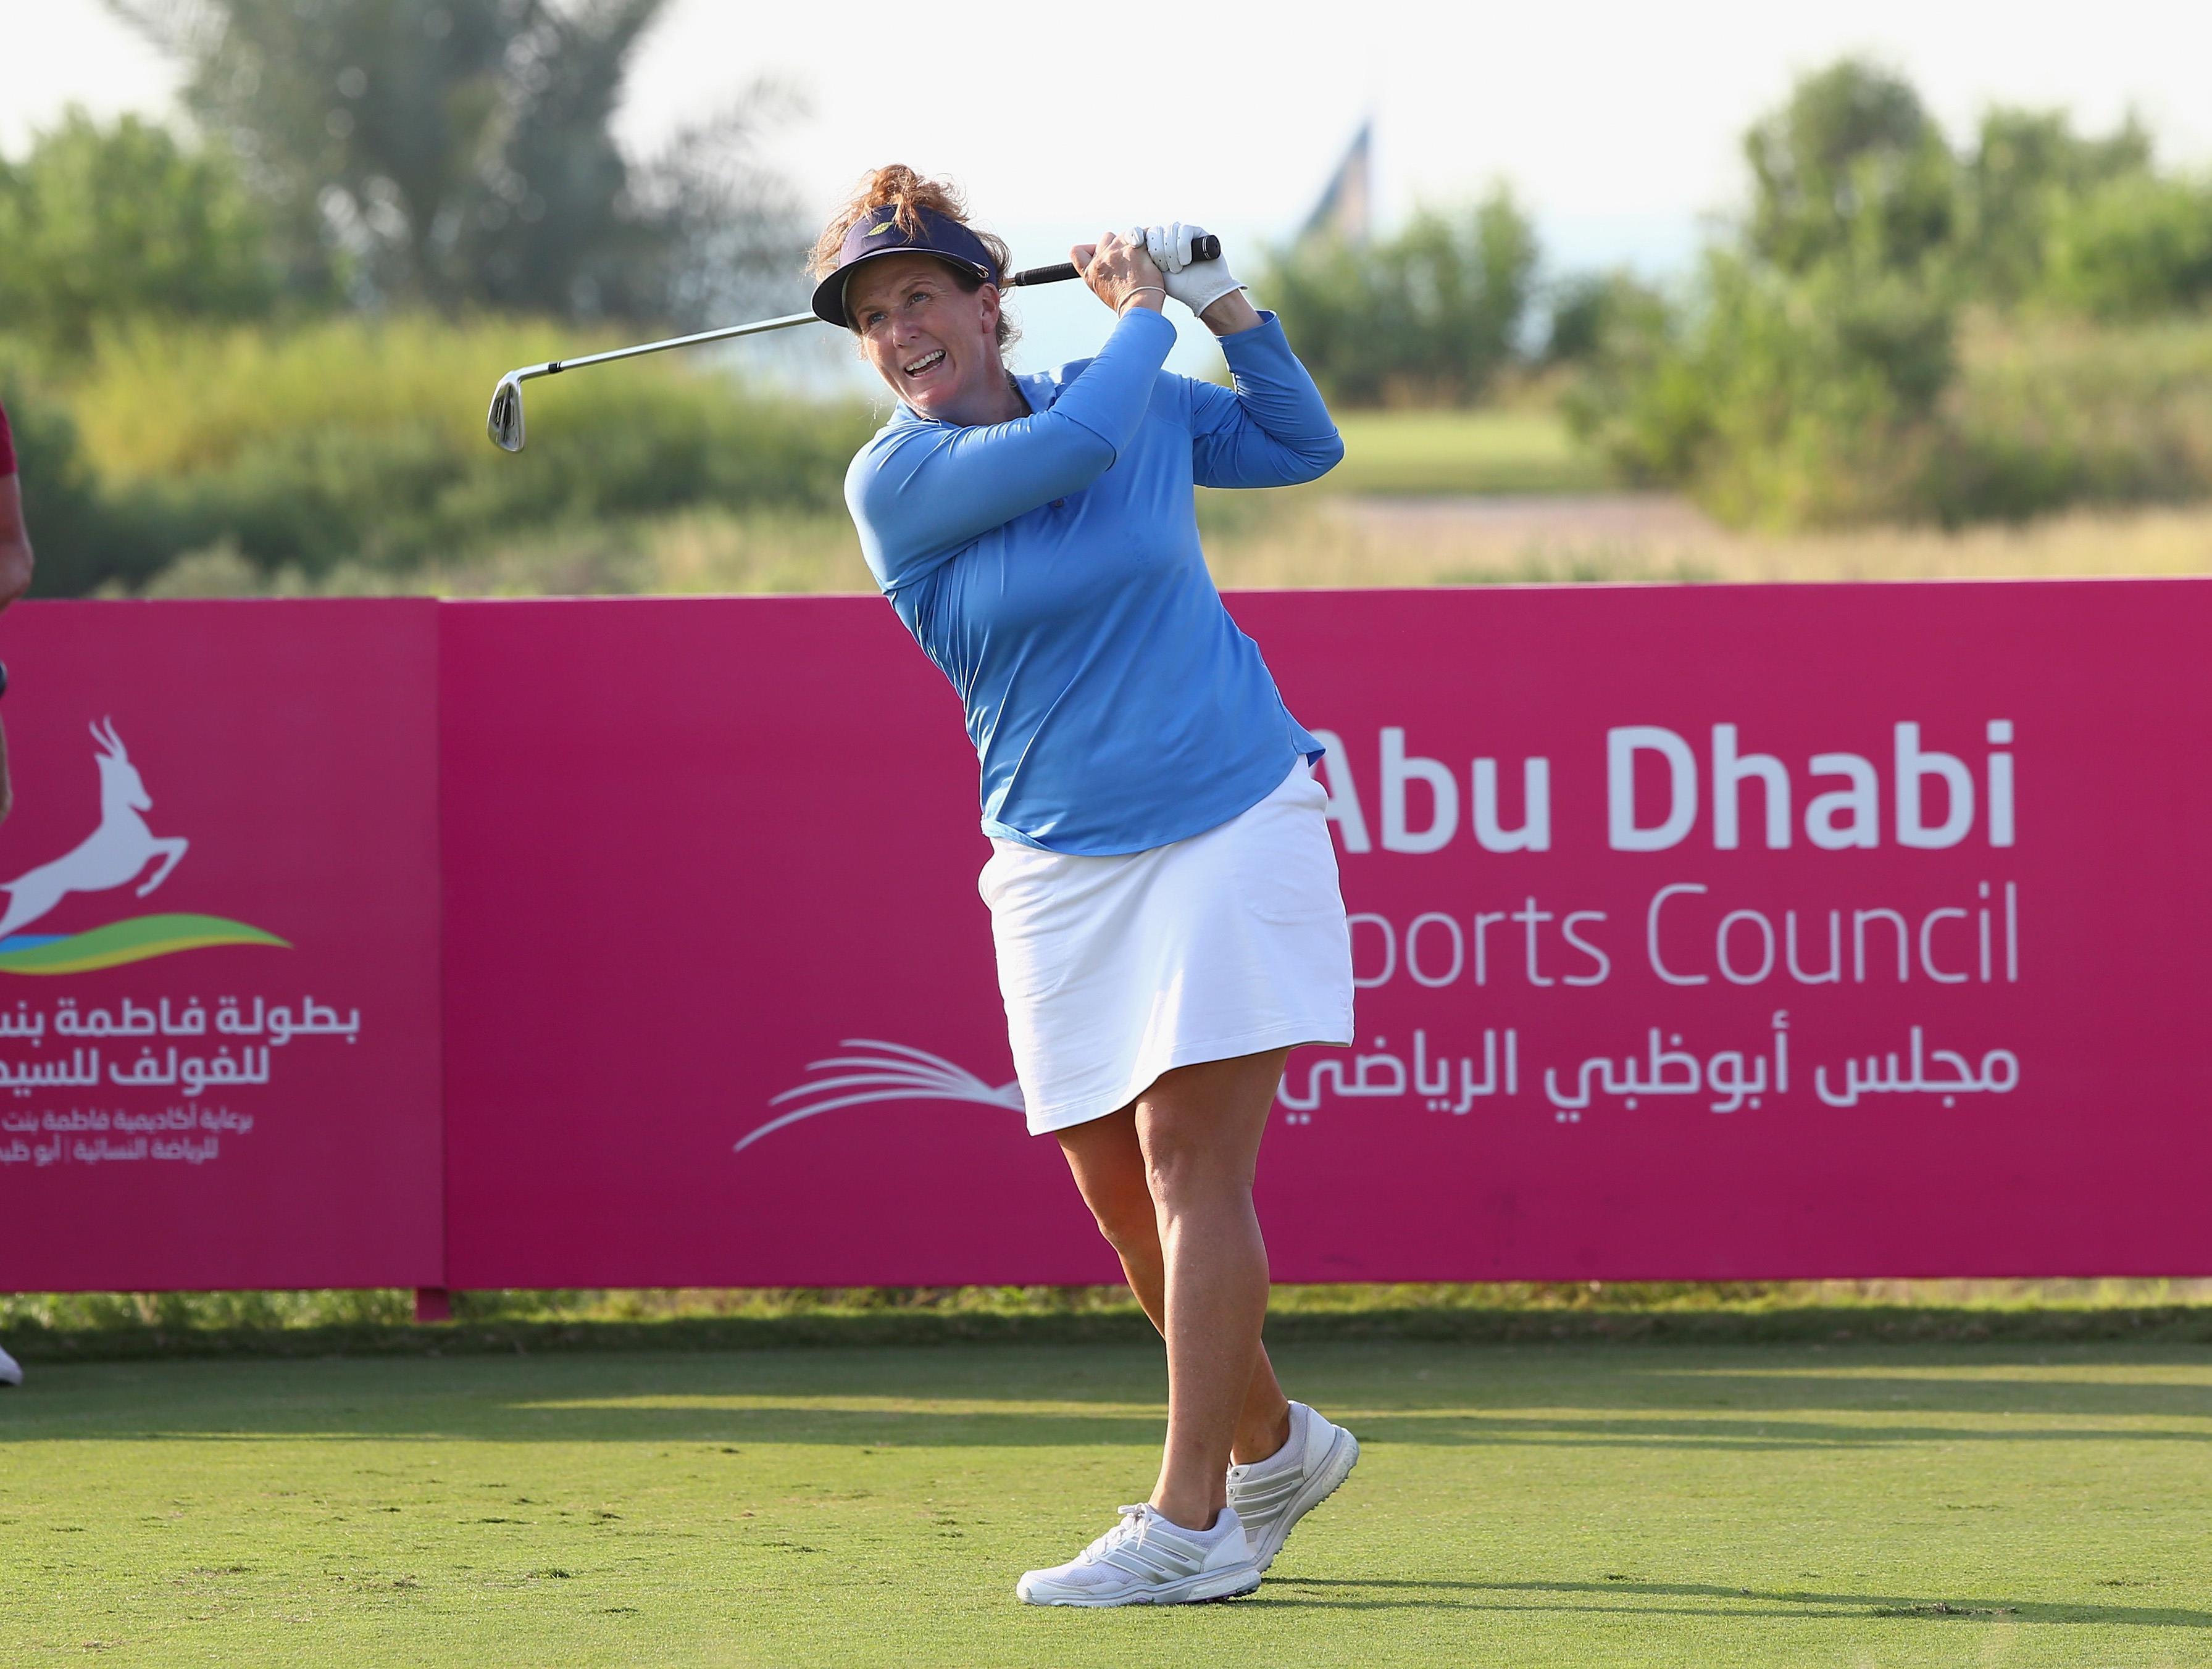 during the final round of the Fatima Bint Mubarak Ladies Open at Saadiyat Beach Golf Club on November 5, 2016 in Abu Dhabi, United Arab Emirates.